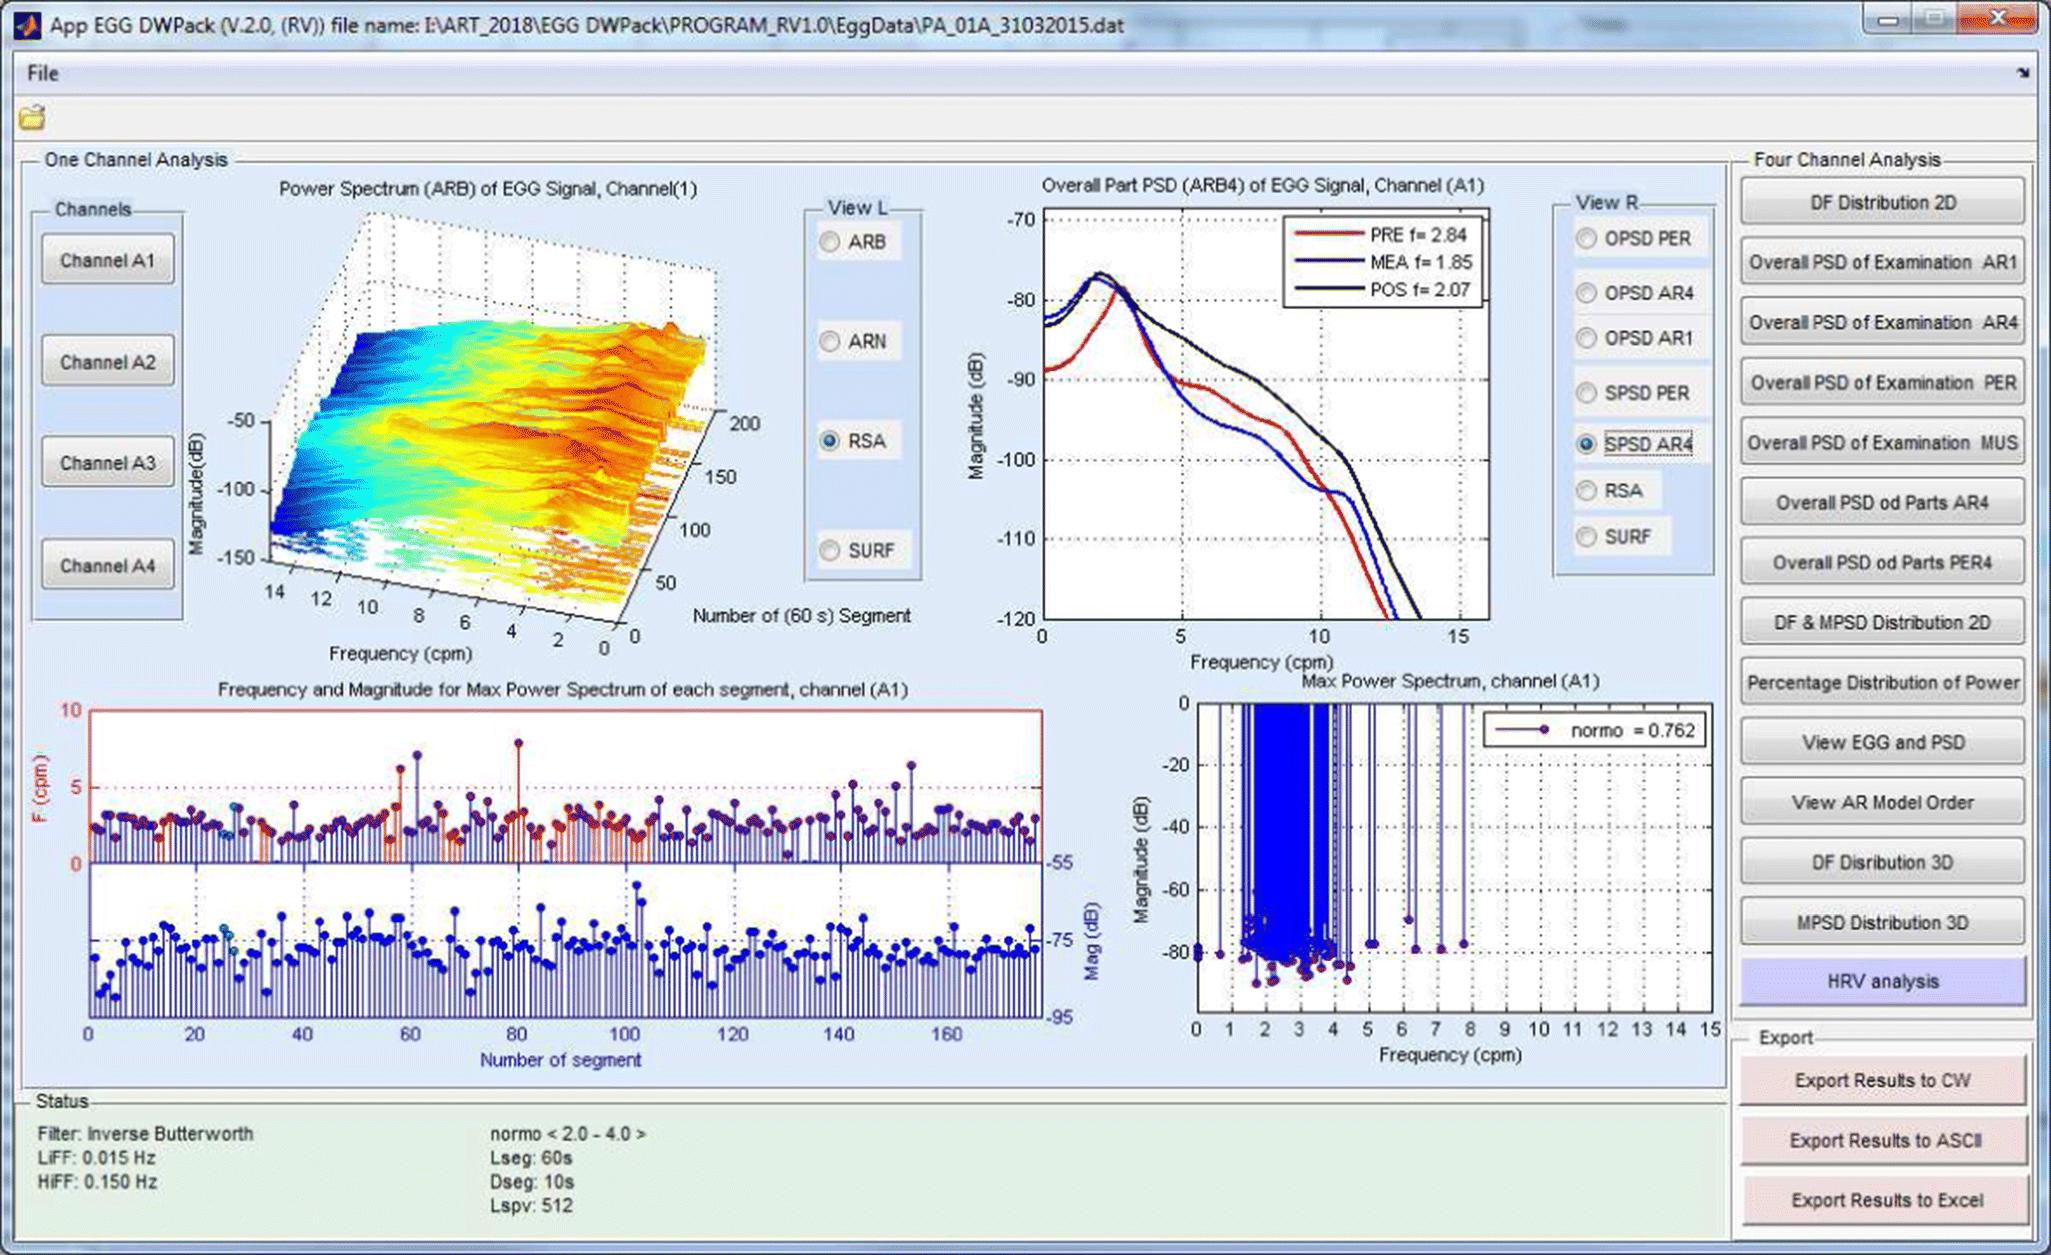 EGG DWPack: System for Multi-Channel Electrogastrographic